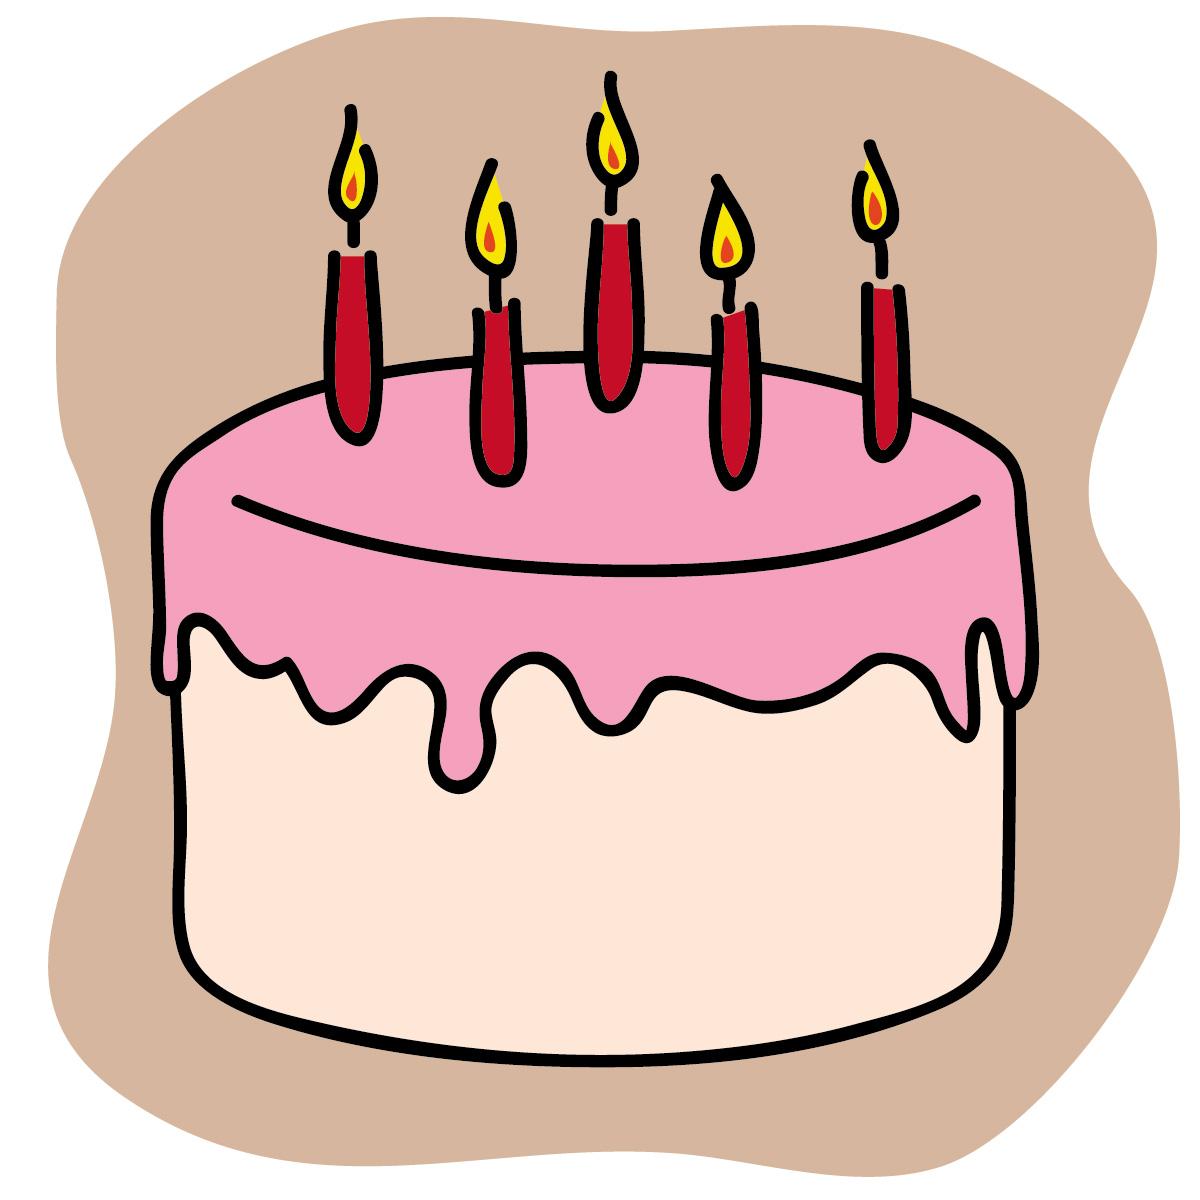 Happy Birthday Cartoon Cake - ClipArt Best